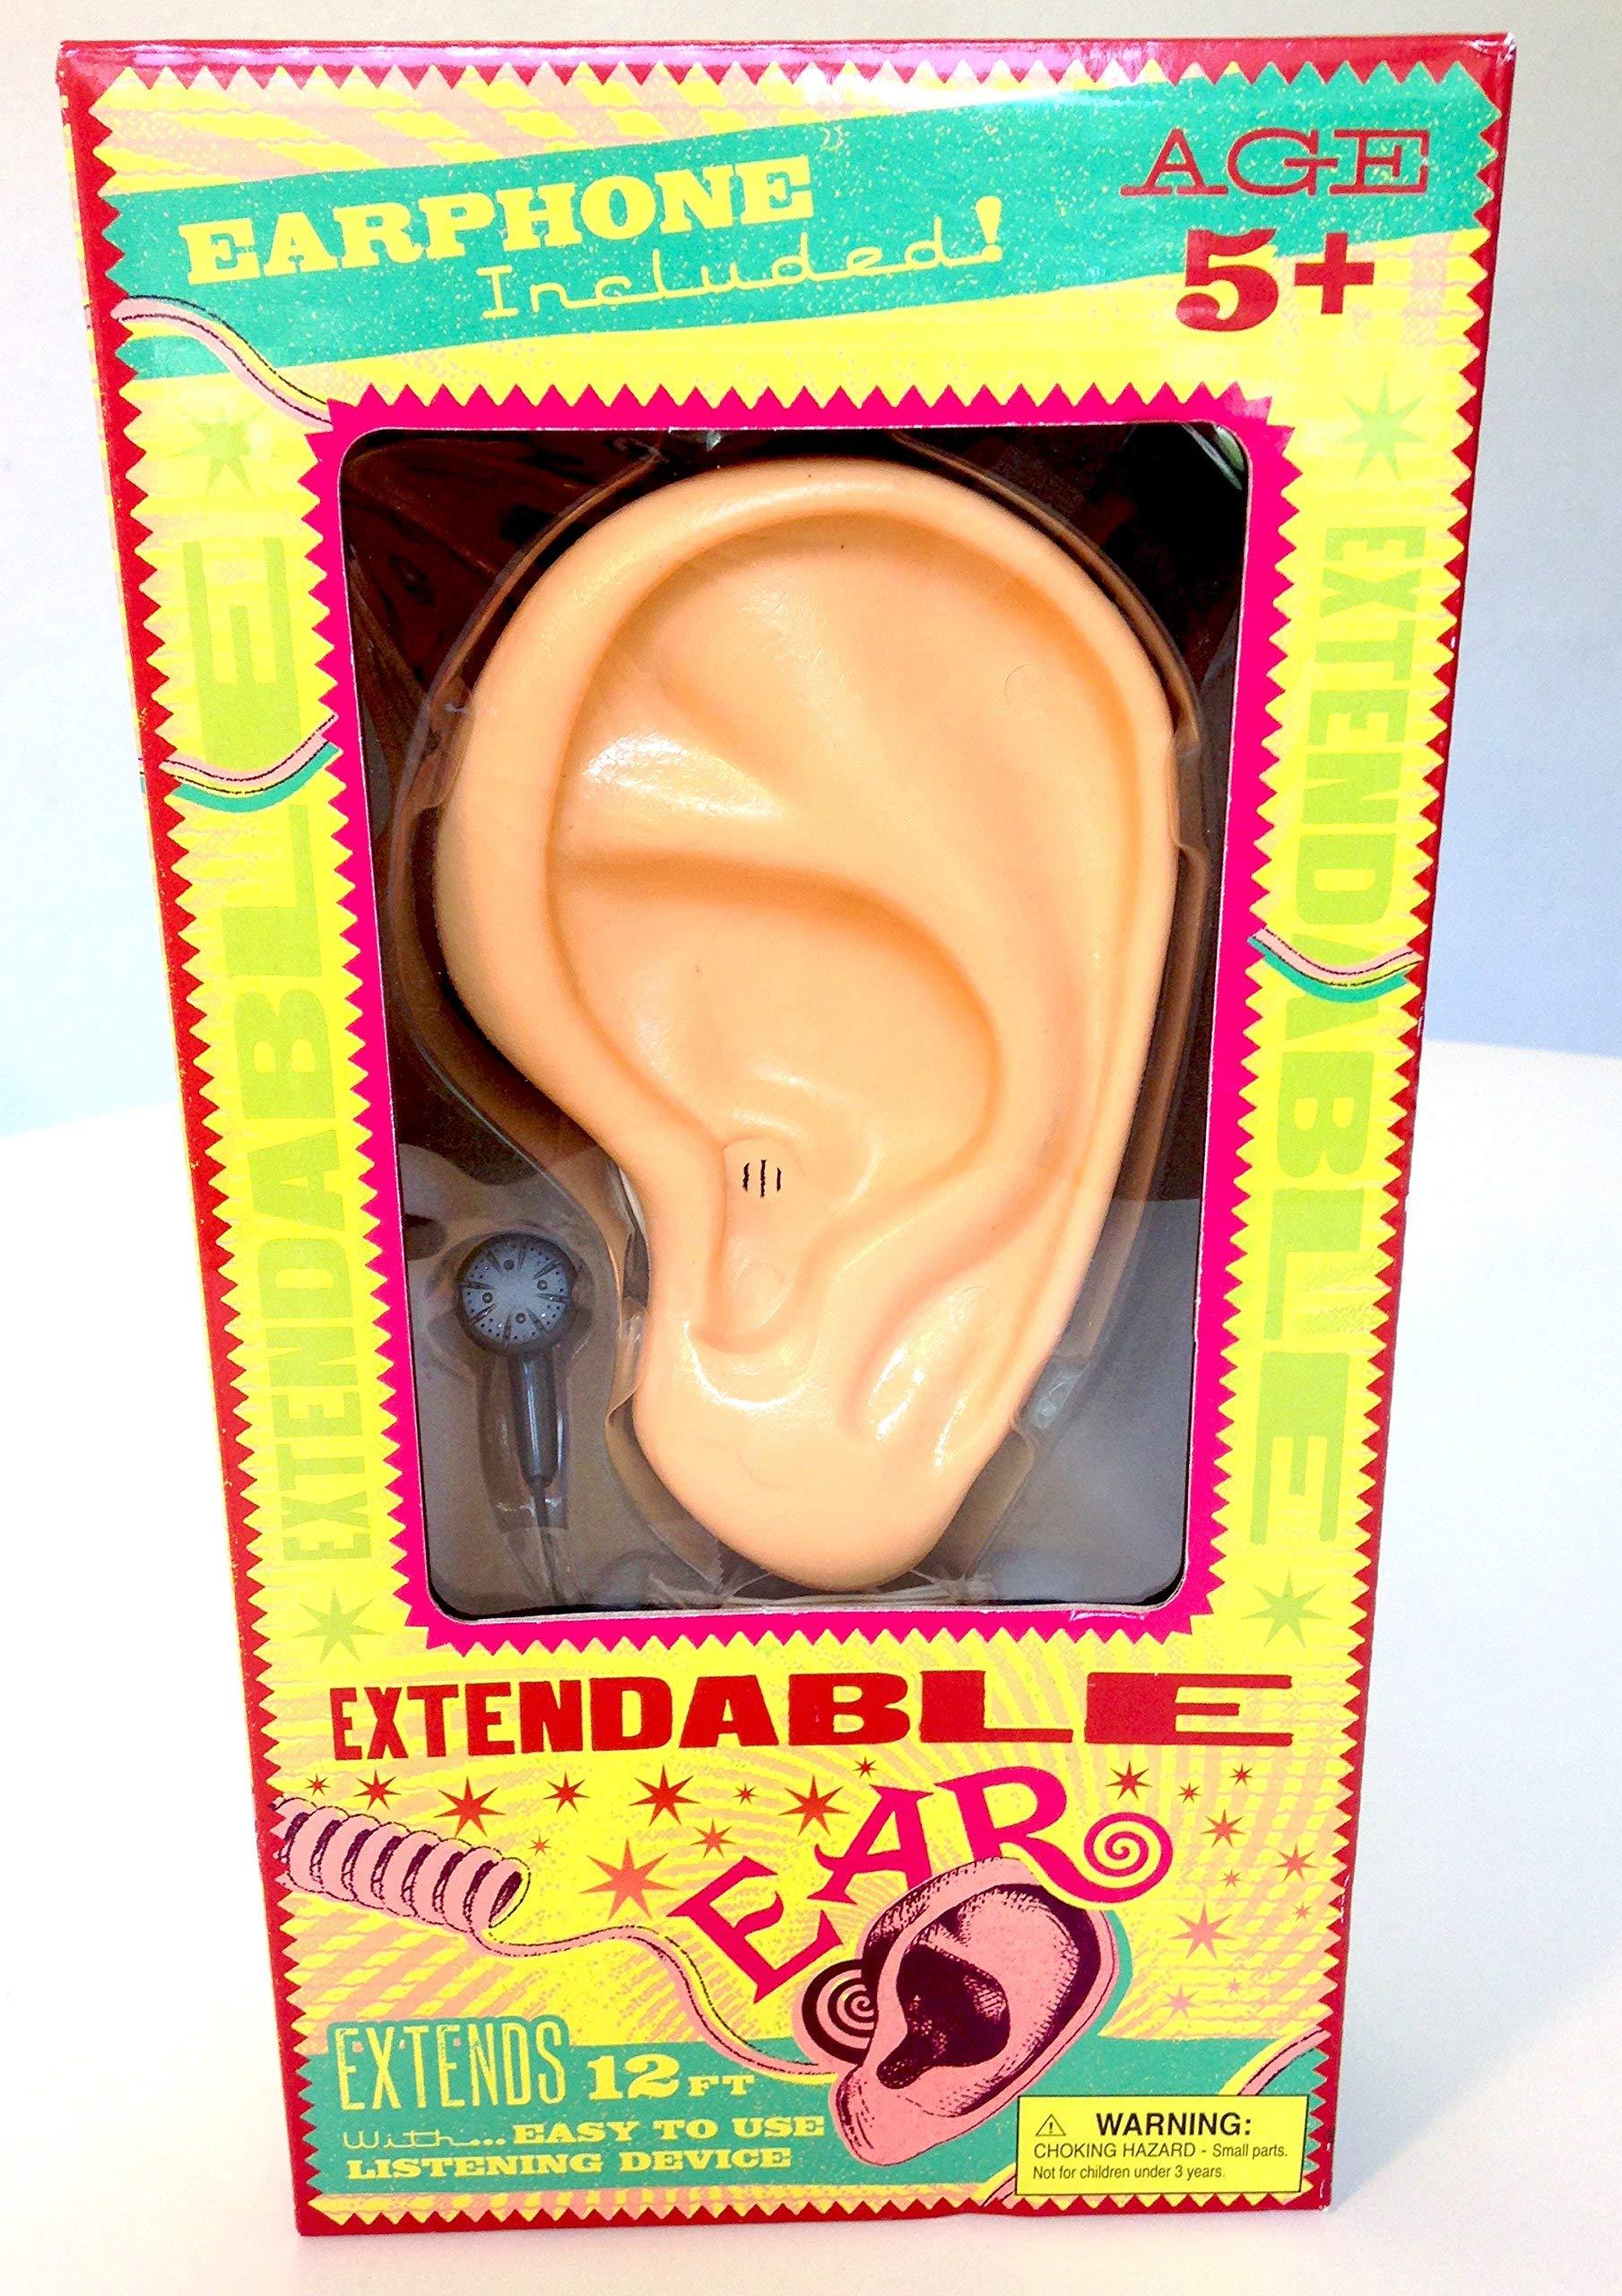 Wizarding World of Harry Potter Weasleys' Wizard Wheezes Electronic Extendable Ear Sound Amplifier Toy Prop Replica